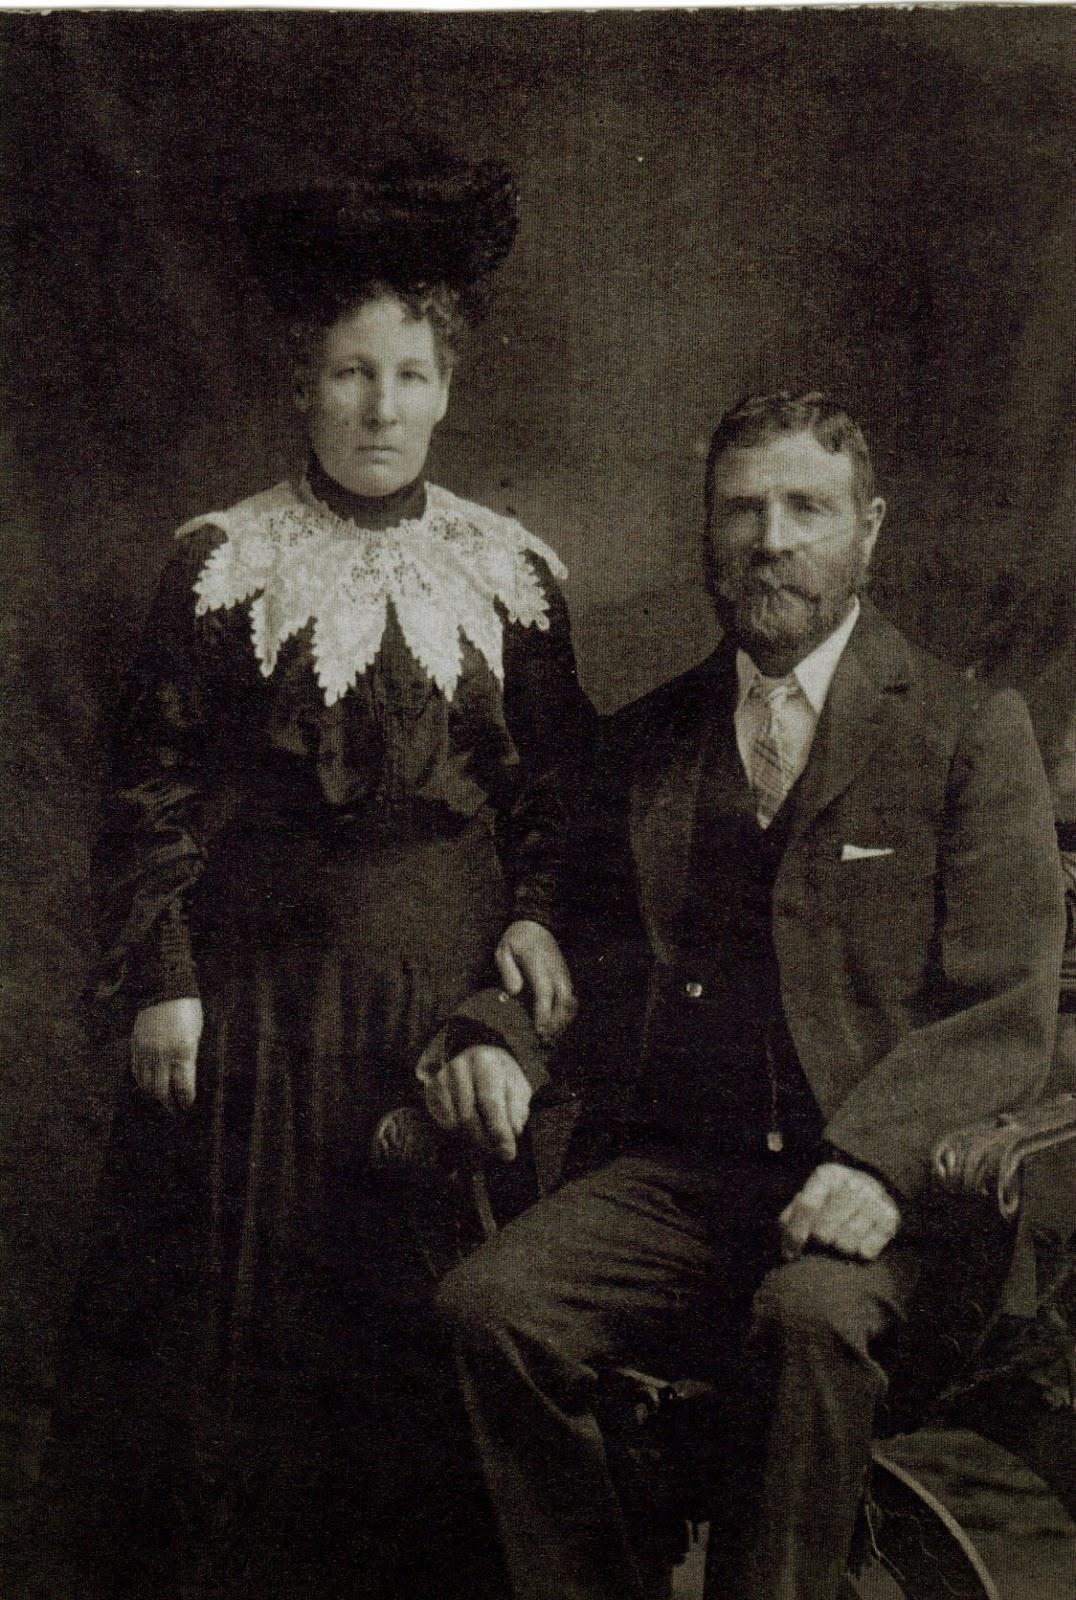 Georgie's Genealogy: The Reyland Family